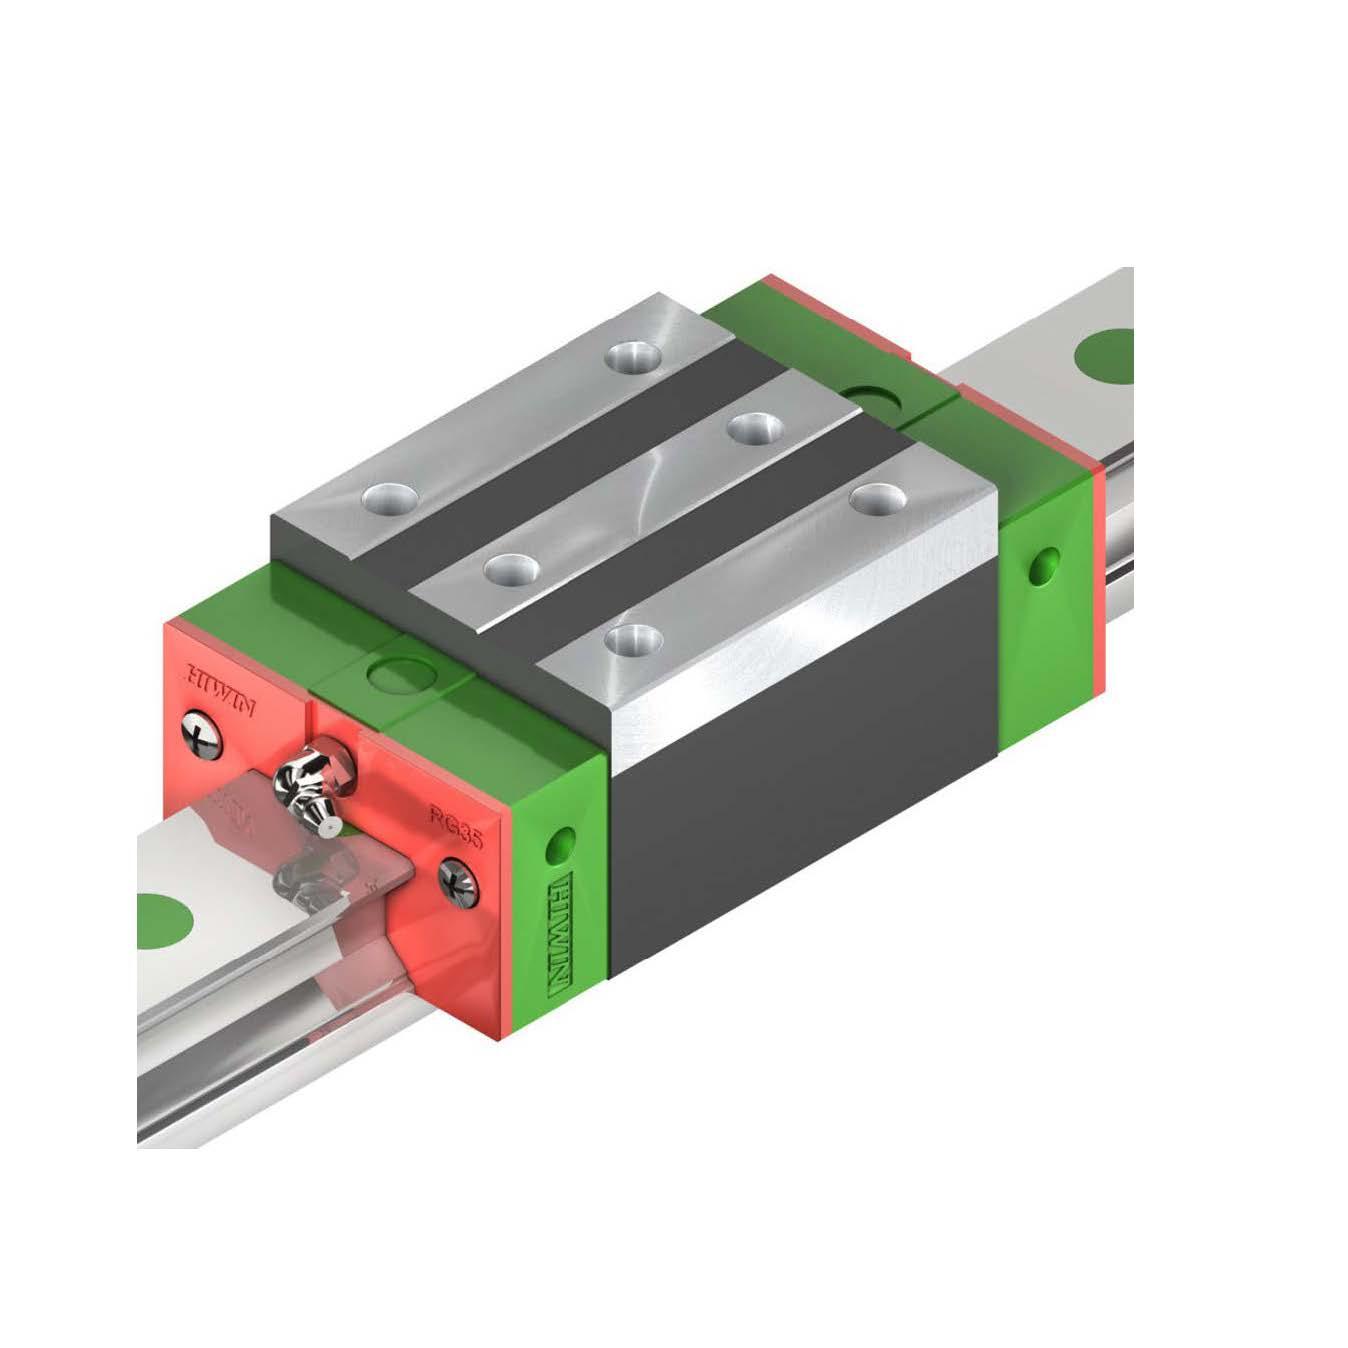 Hiwin RG Series Linear Type Block